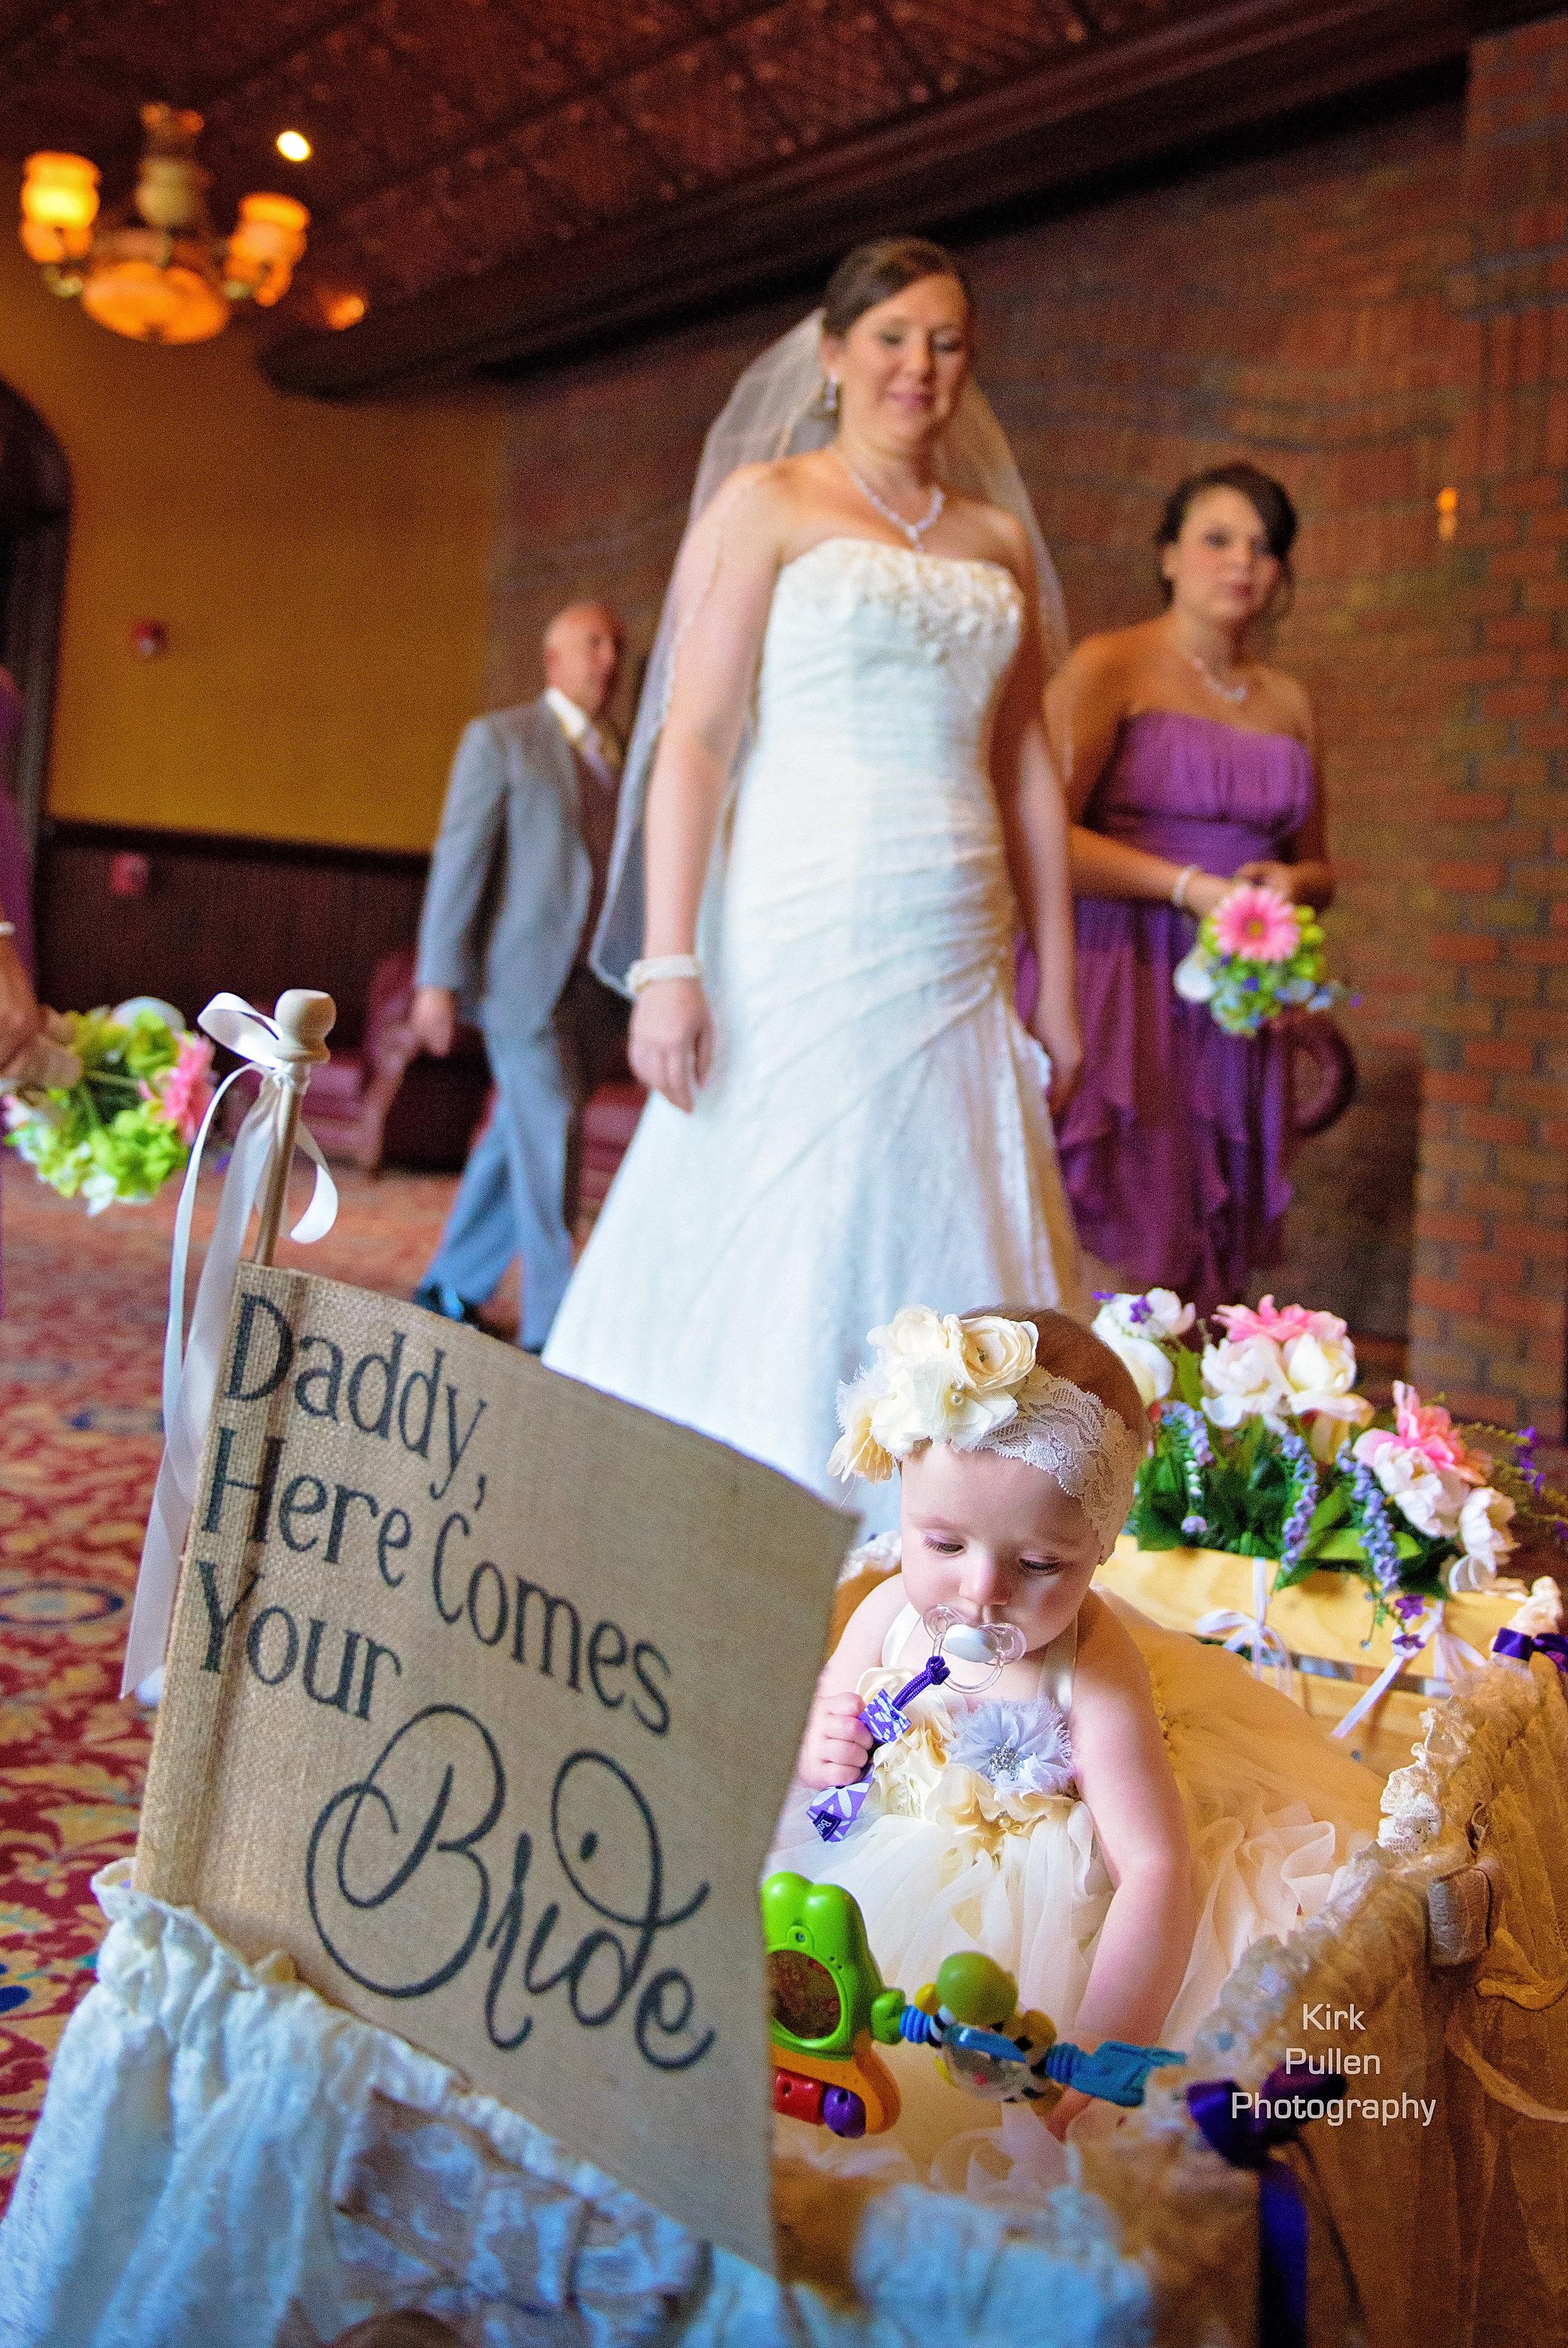 mad-boar-wallace-wedding-venue.jpg